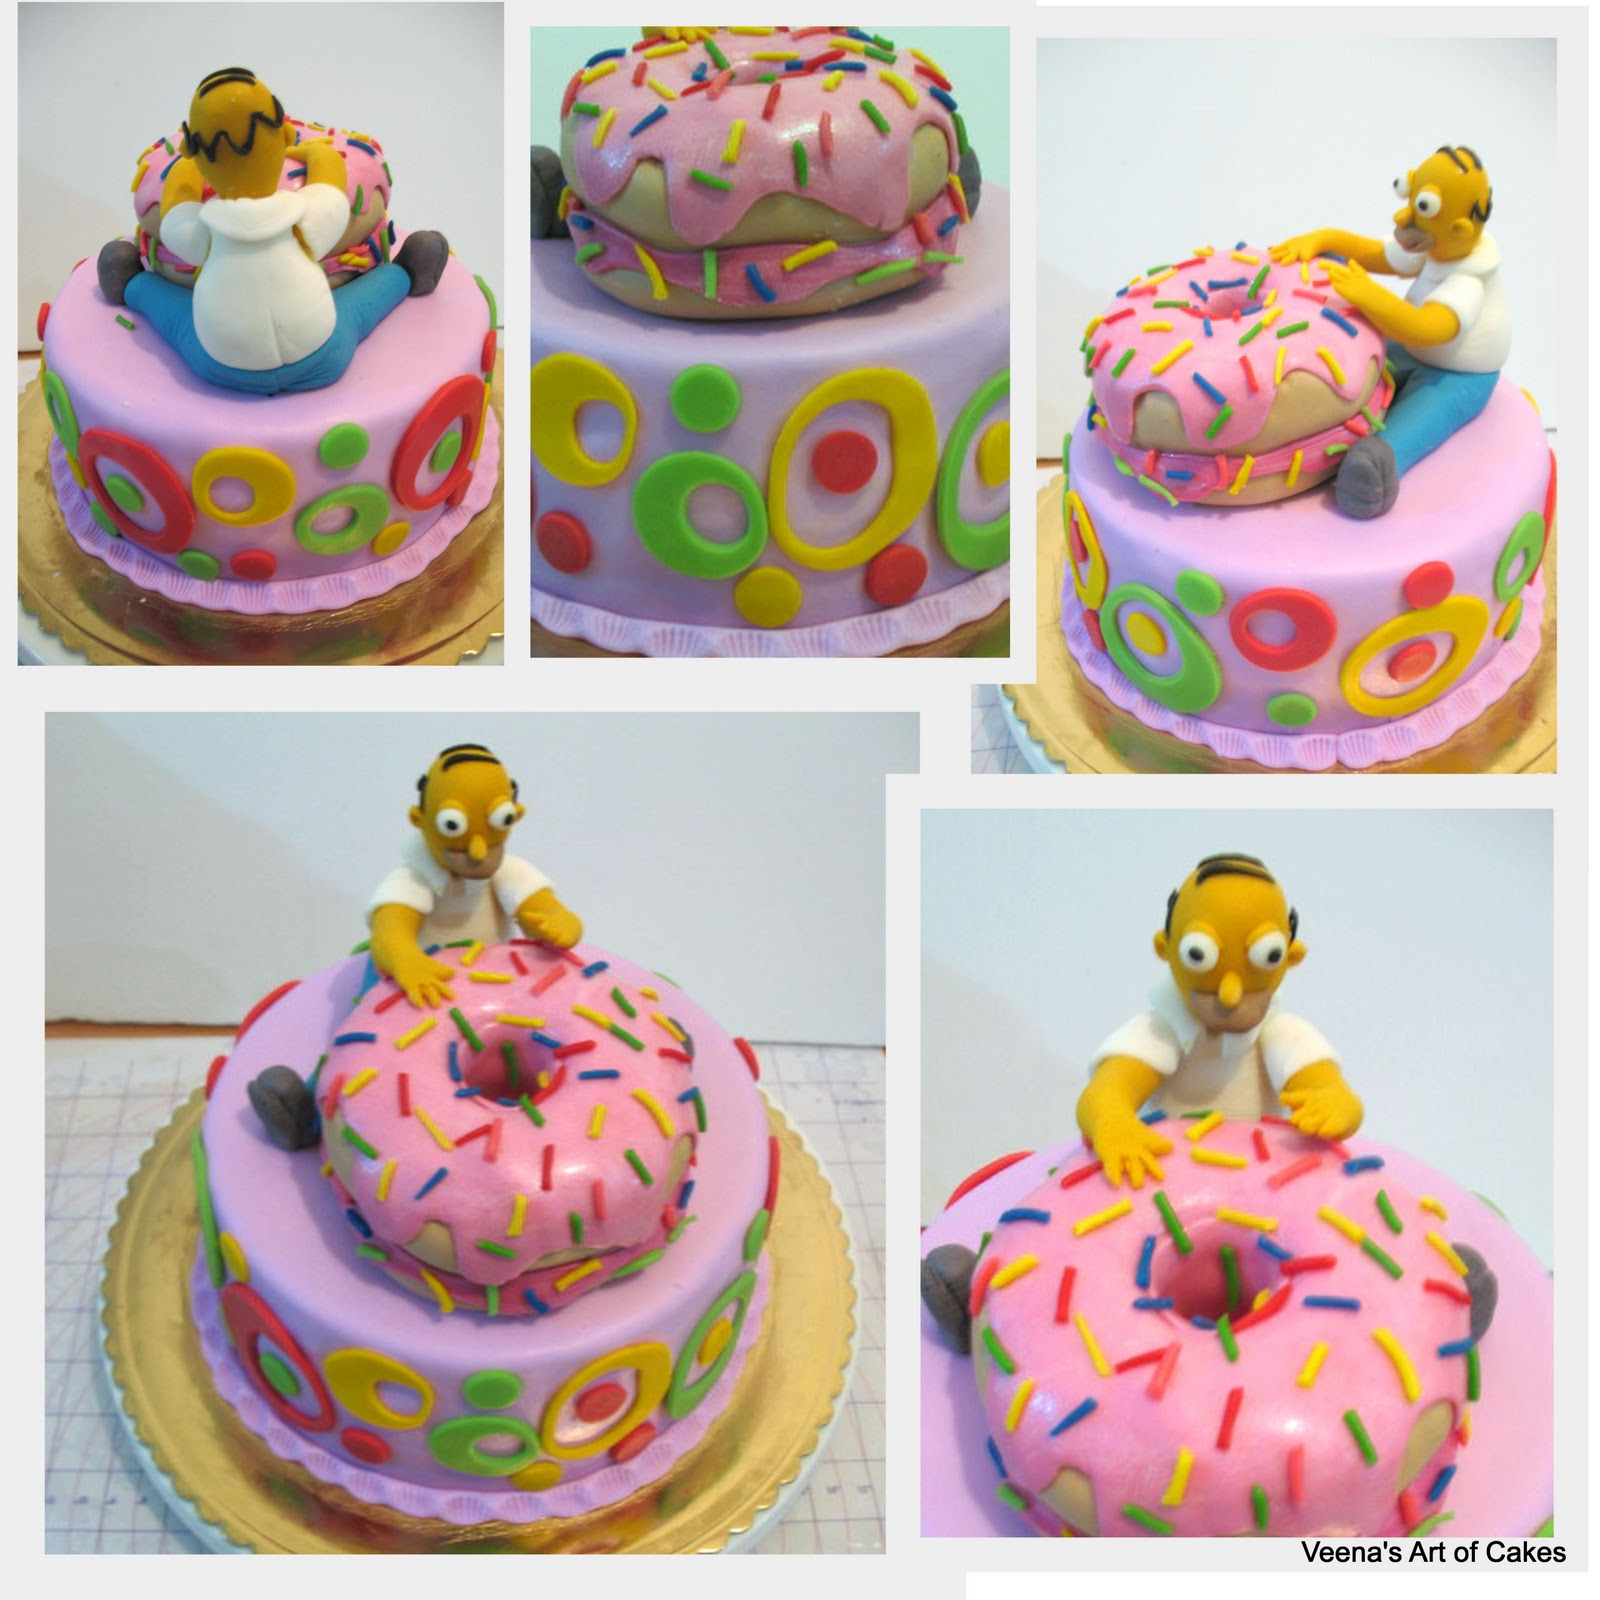 Stupendous Doughnut Cake With Homer Simpson Veena Azmanov Funny Birthday Cards Online Sheoxdamsfinfo